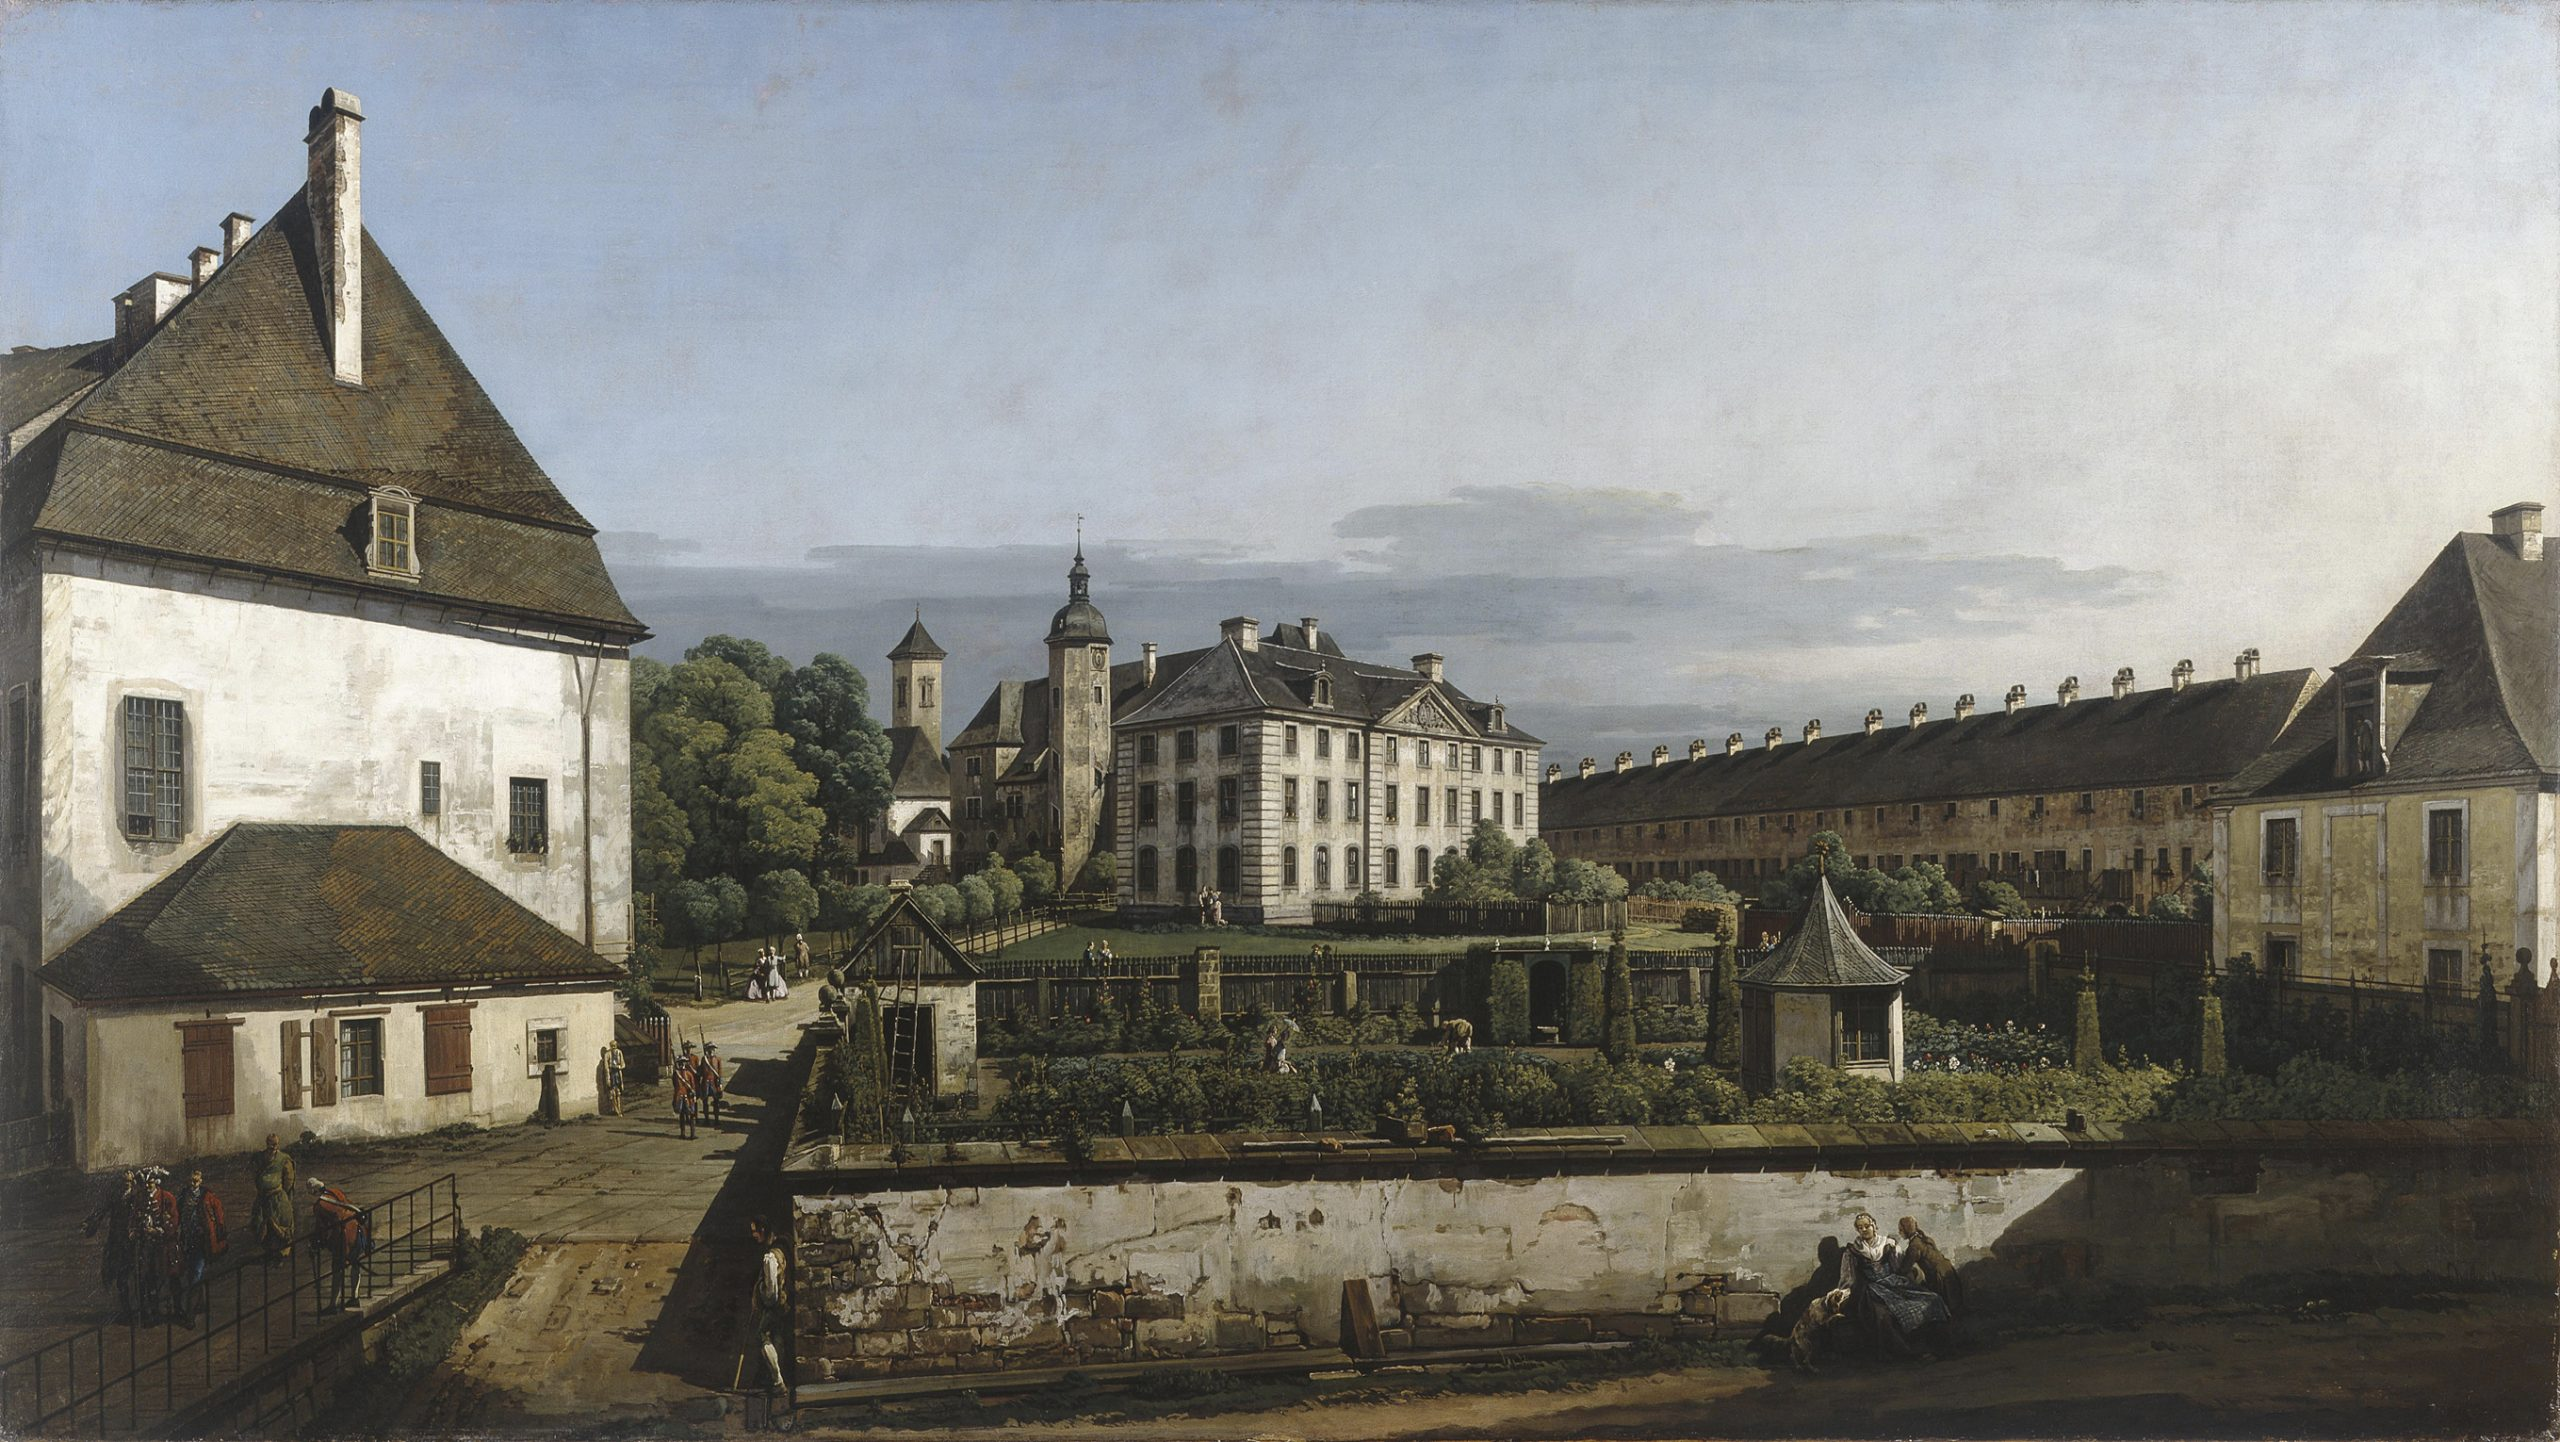 Bernardo Bellotto (1722–1780) The Fortress of Königstein Courtyard with the Brunnenhaus, 1756–8 Oil on canvas, 133.9 × 238 cm, © Manchester Art Gallery, UK  Bridgeman Images